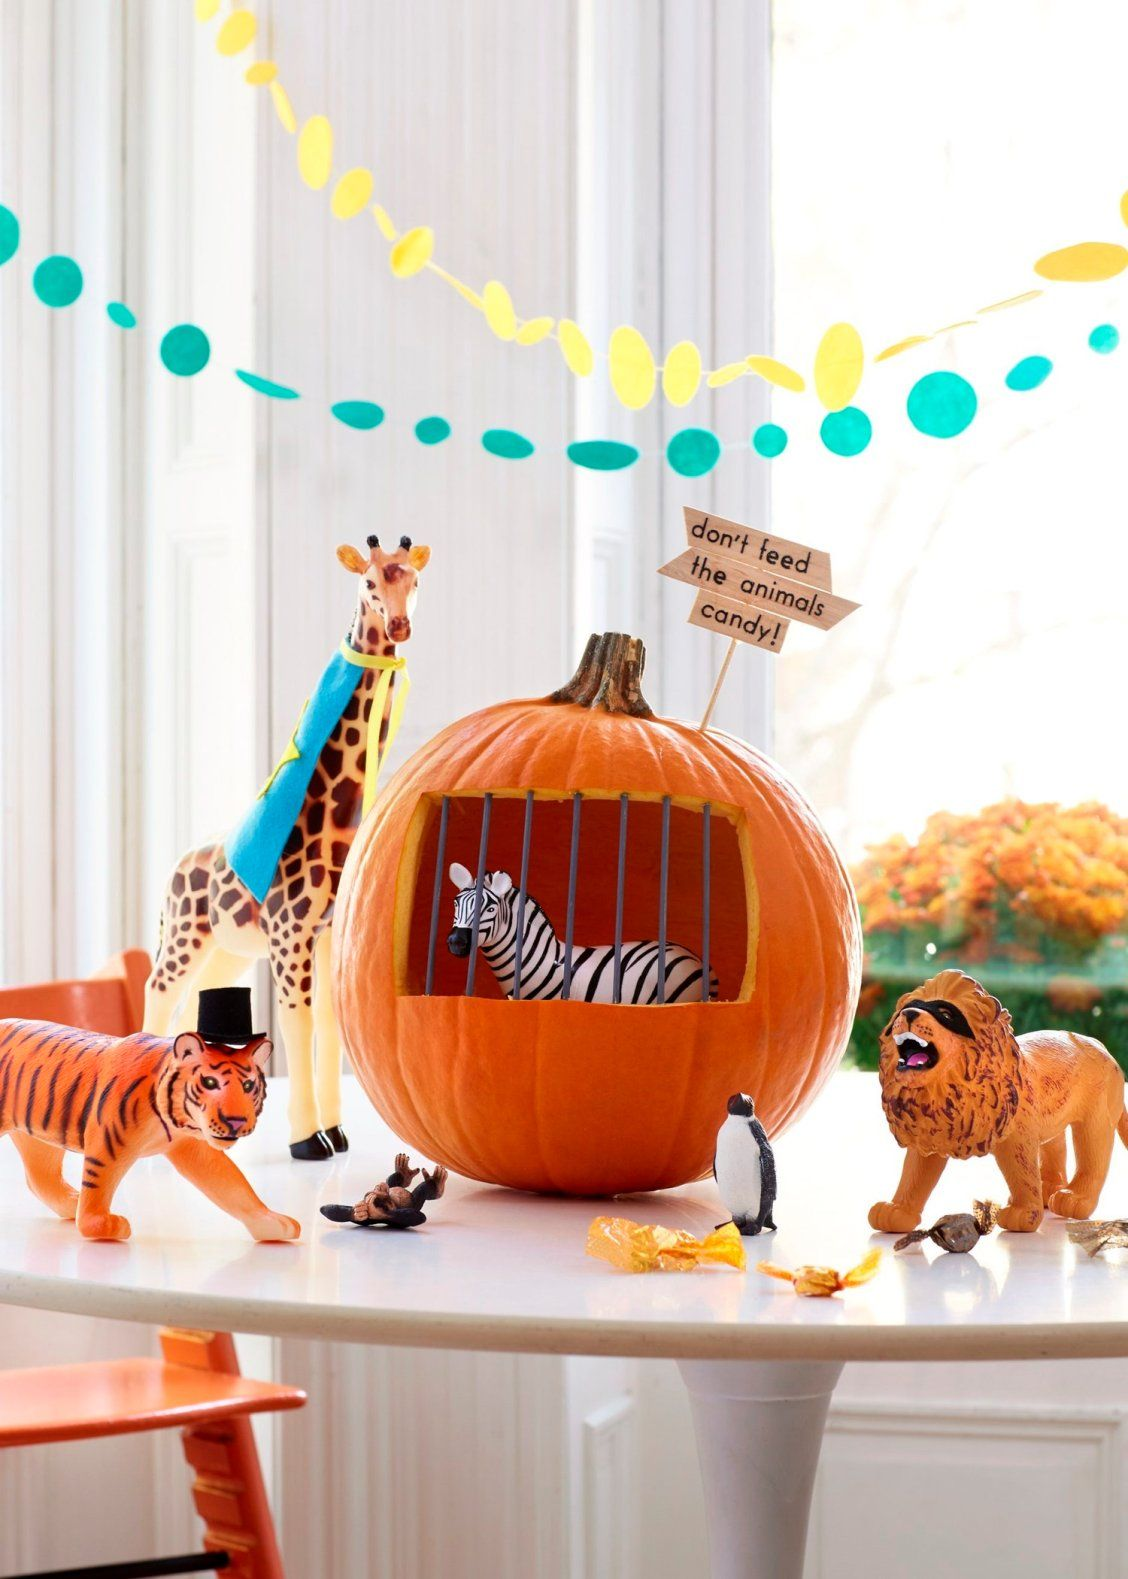 6 Adorable Ways to Decorate Halloween Pumpkins with Kids Pumpkin - Decorating For Halloween